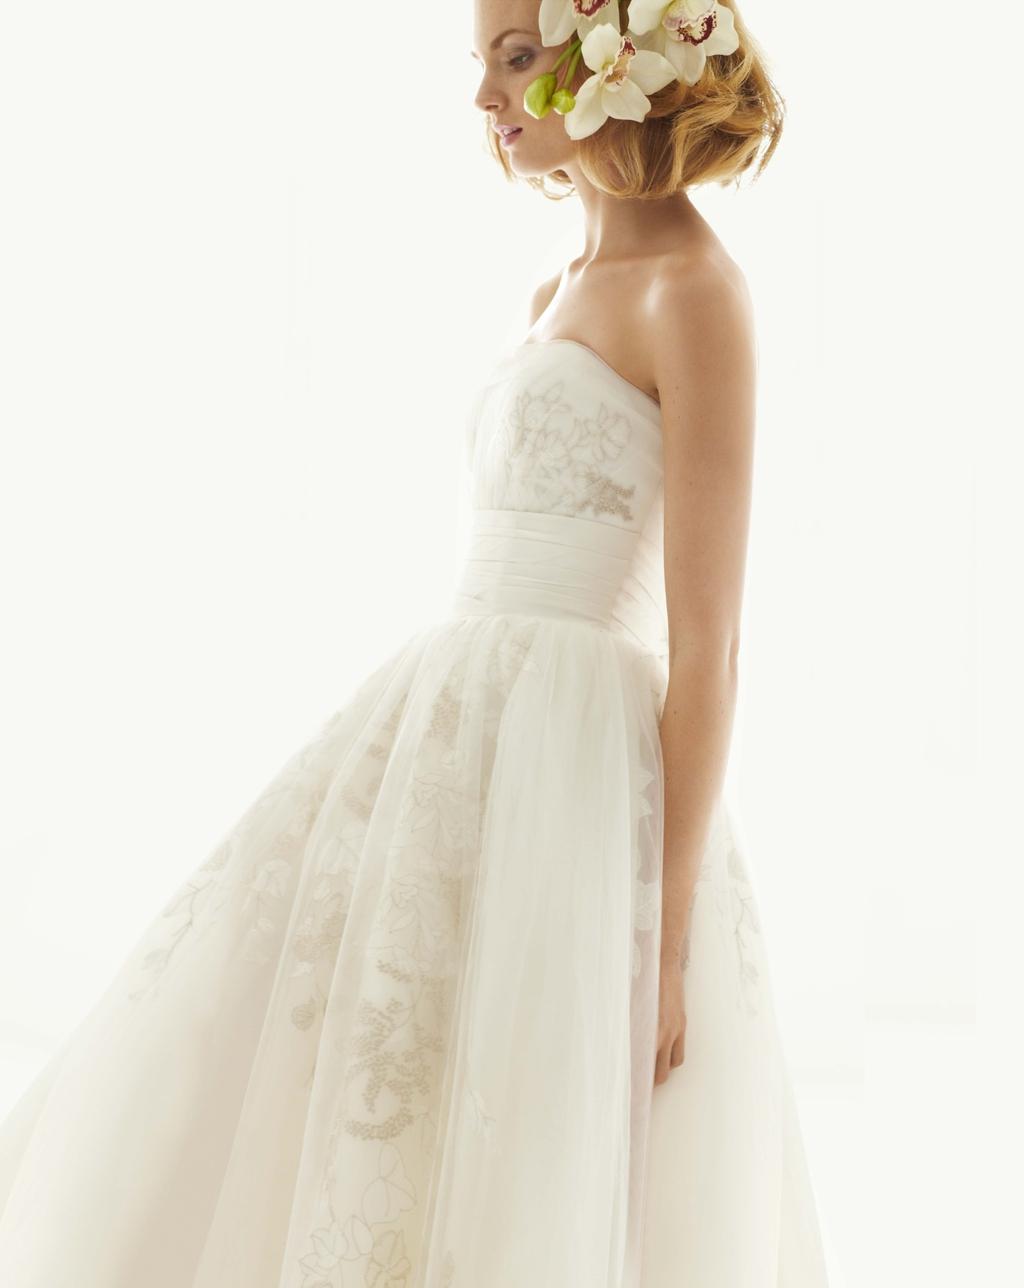 2013-wedding-dress-melissa-sweet-for-davids-bridal-3857.full